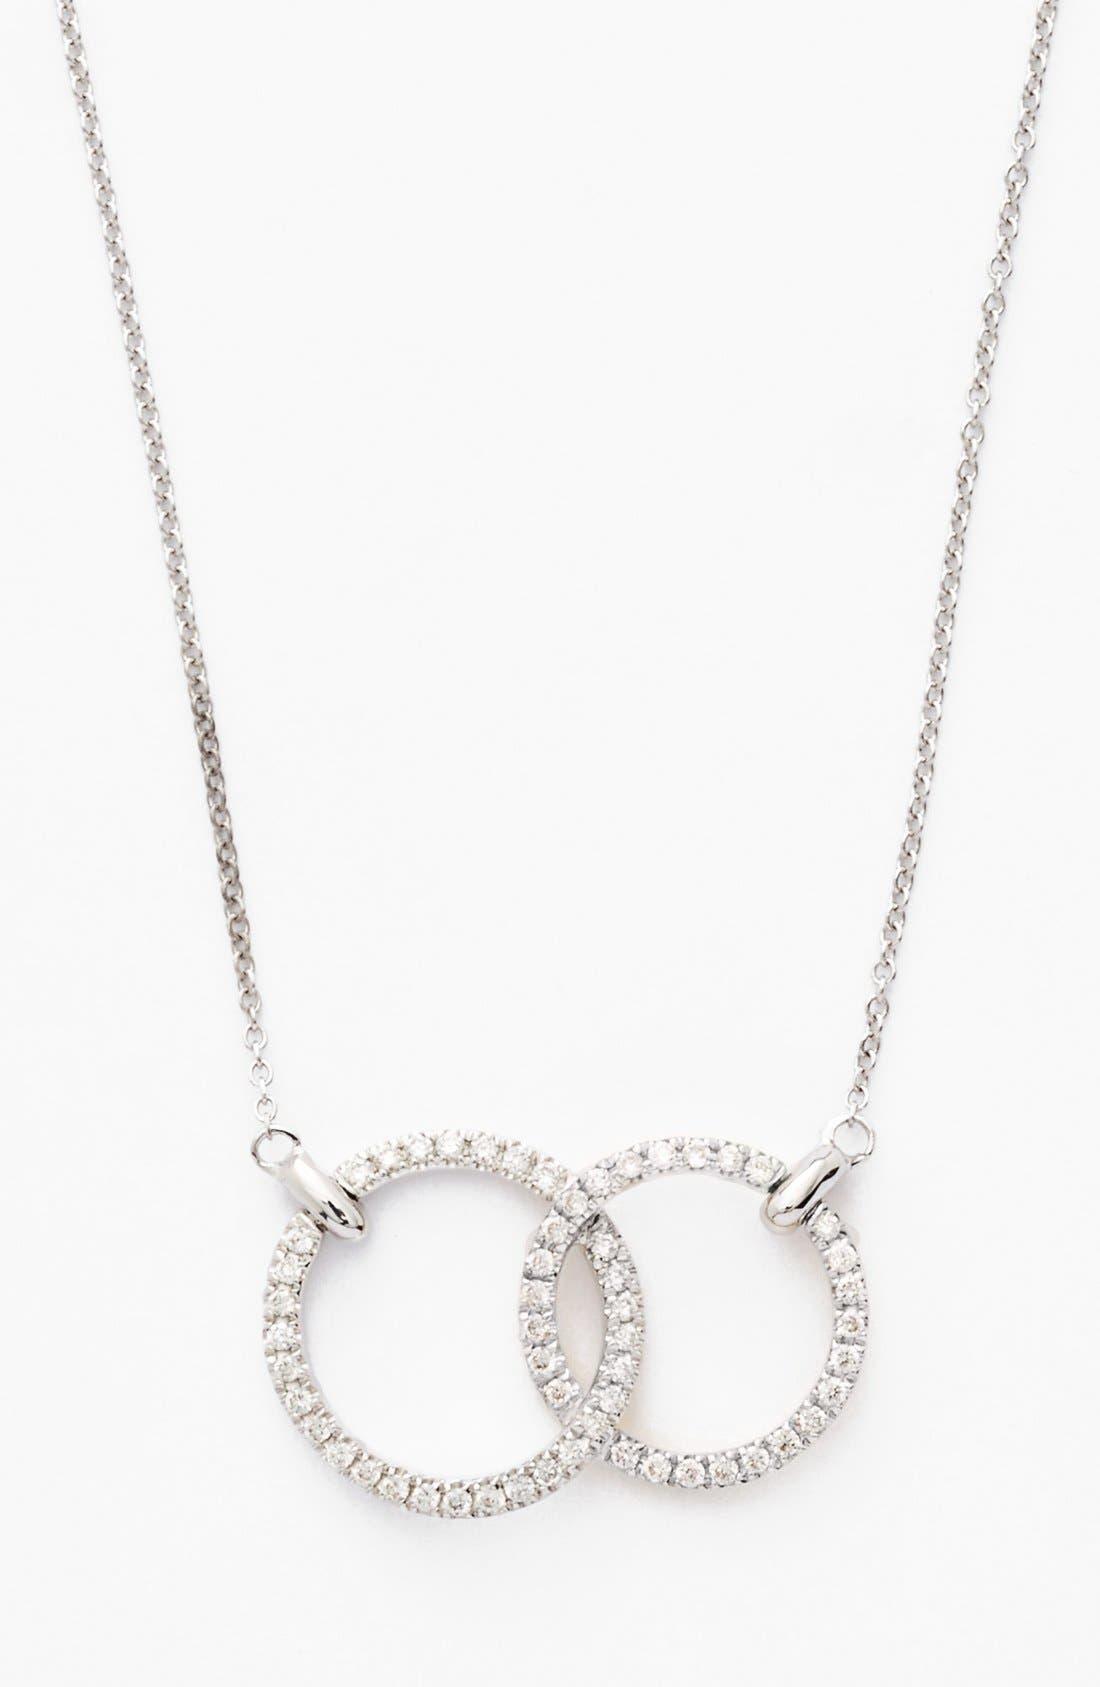 Double Diamond Circle Pendant Necklace,                         Main,                         color, WHITE GOLD